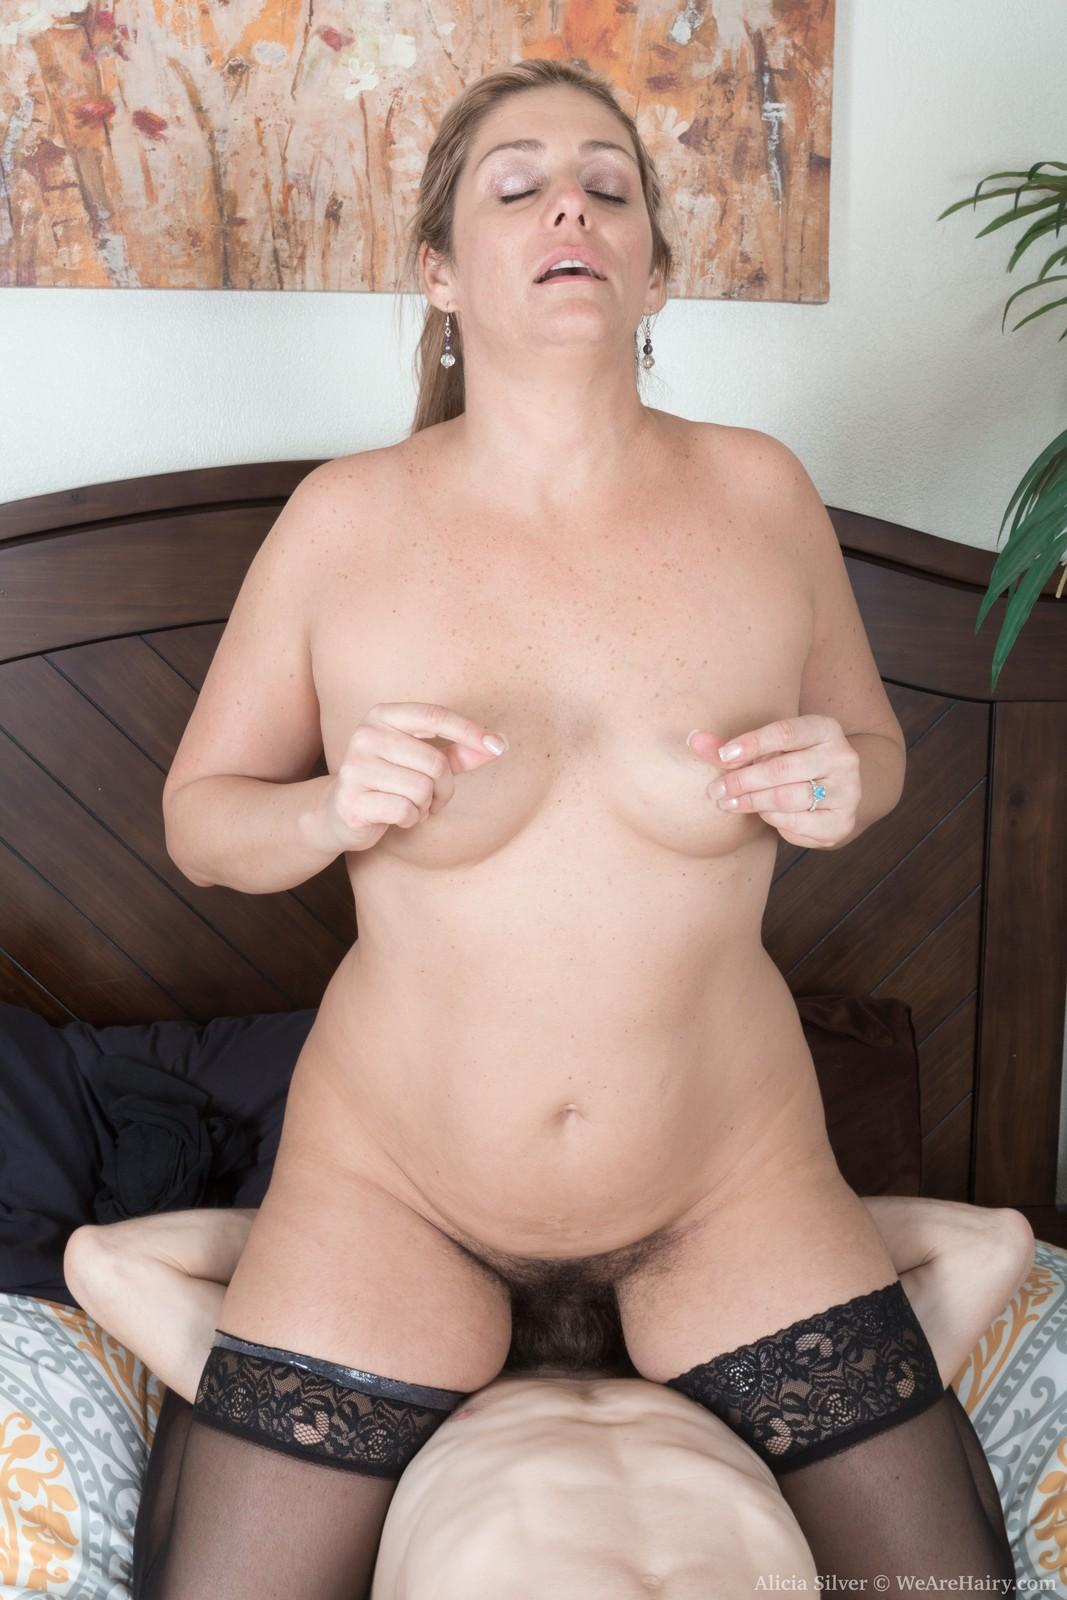 alicia-silver-has-hot-sex-in-her-bedroom7.jpg